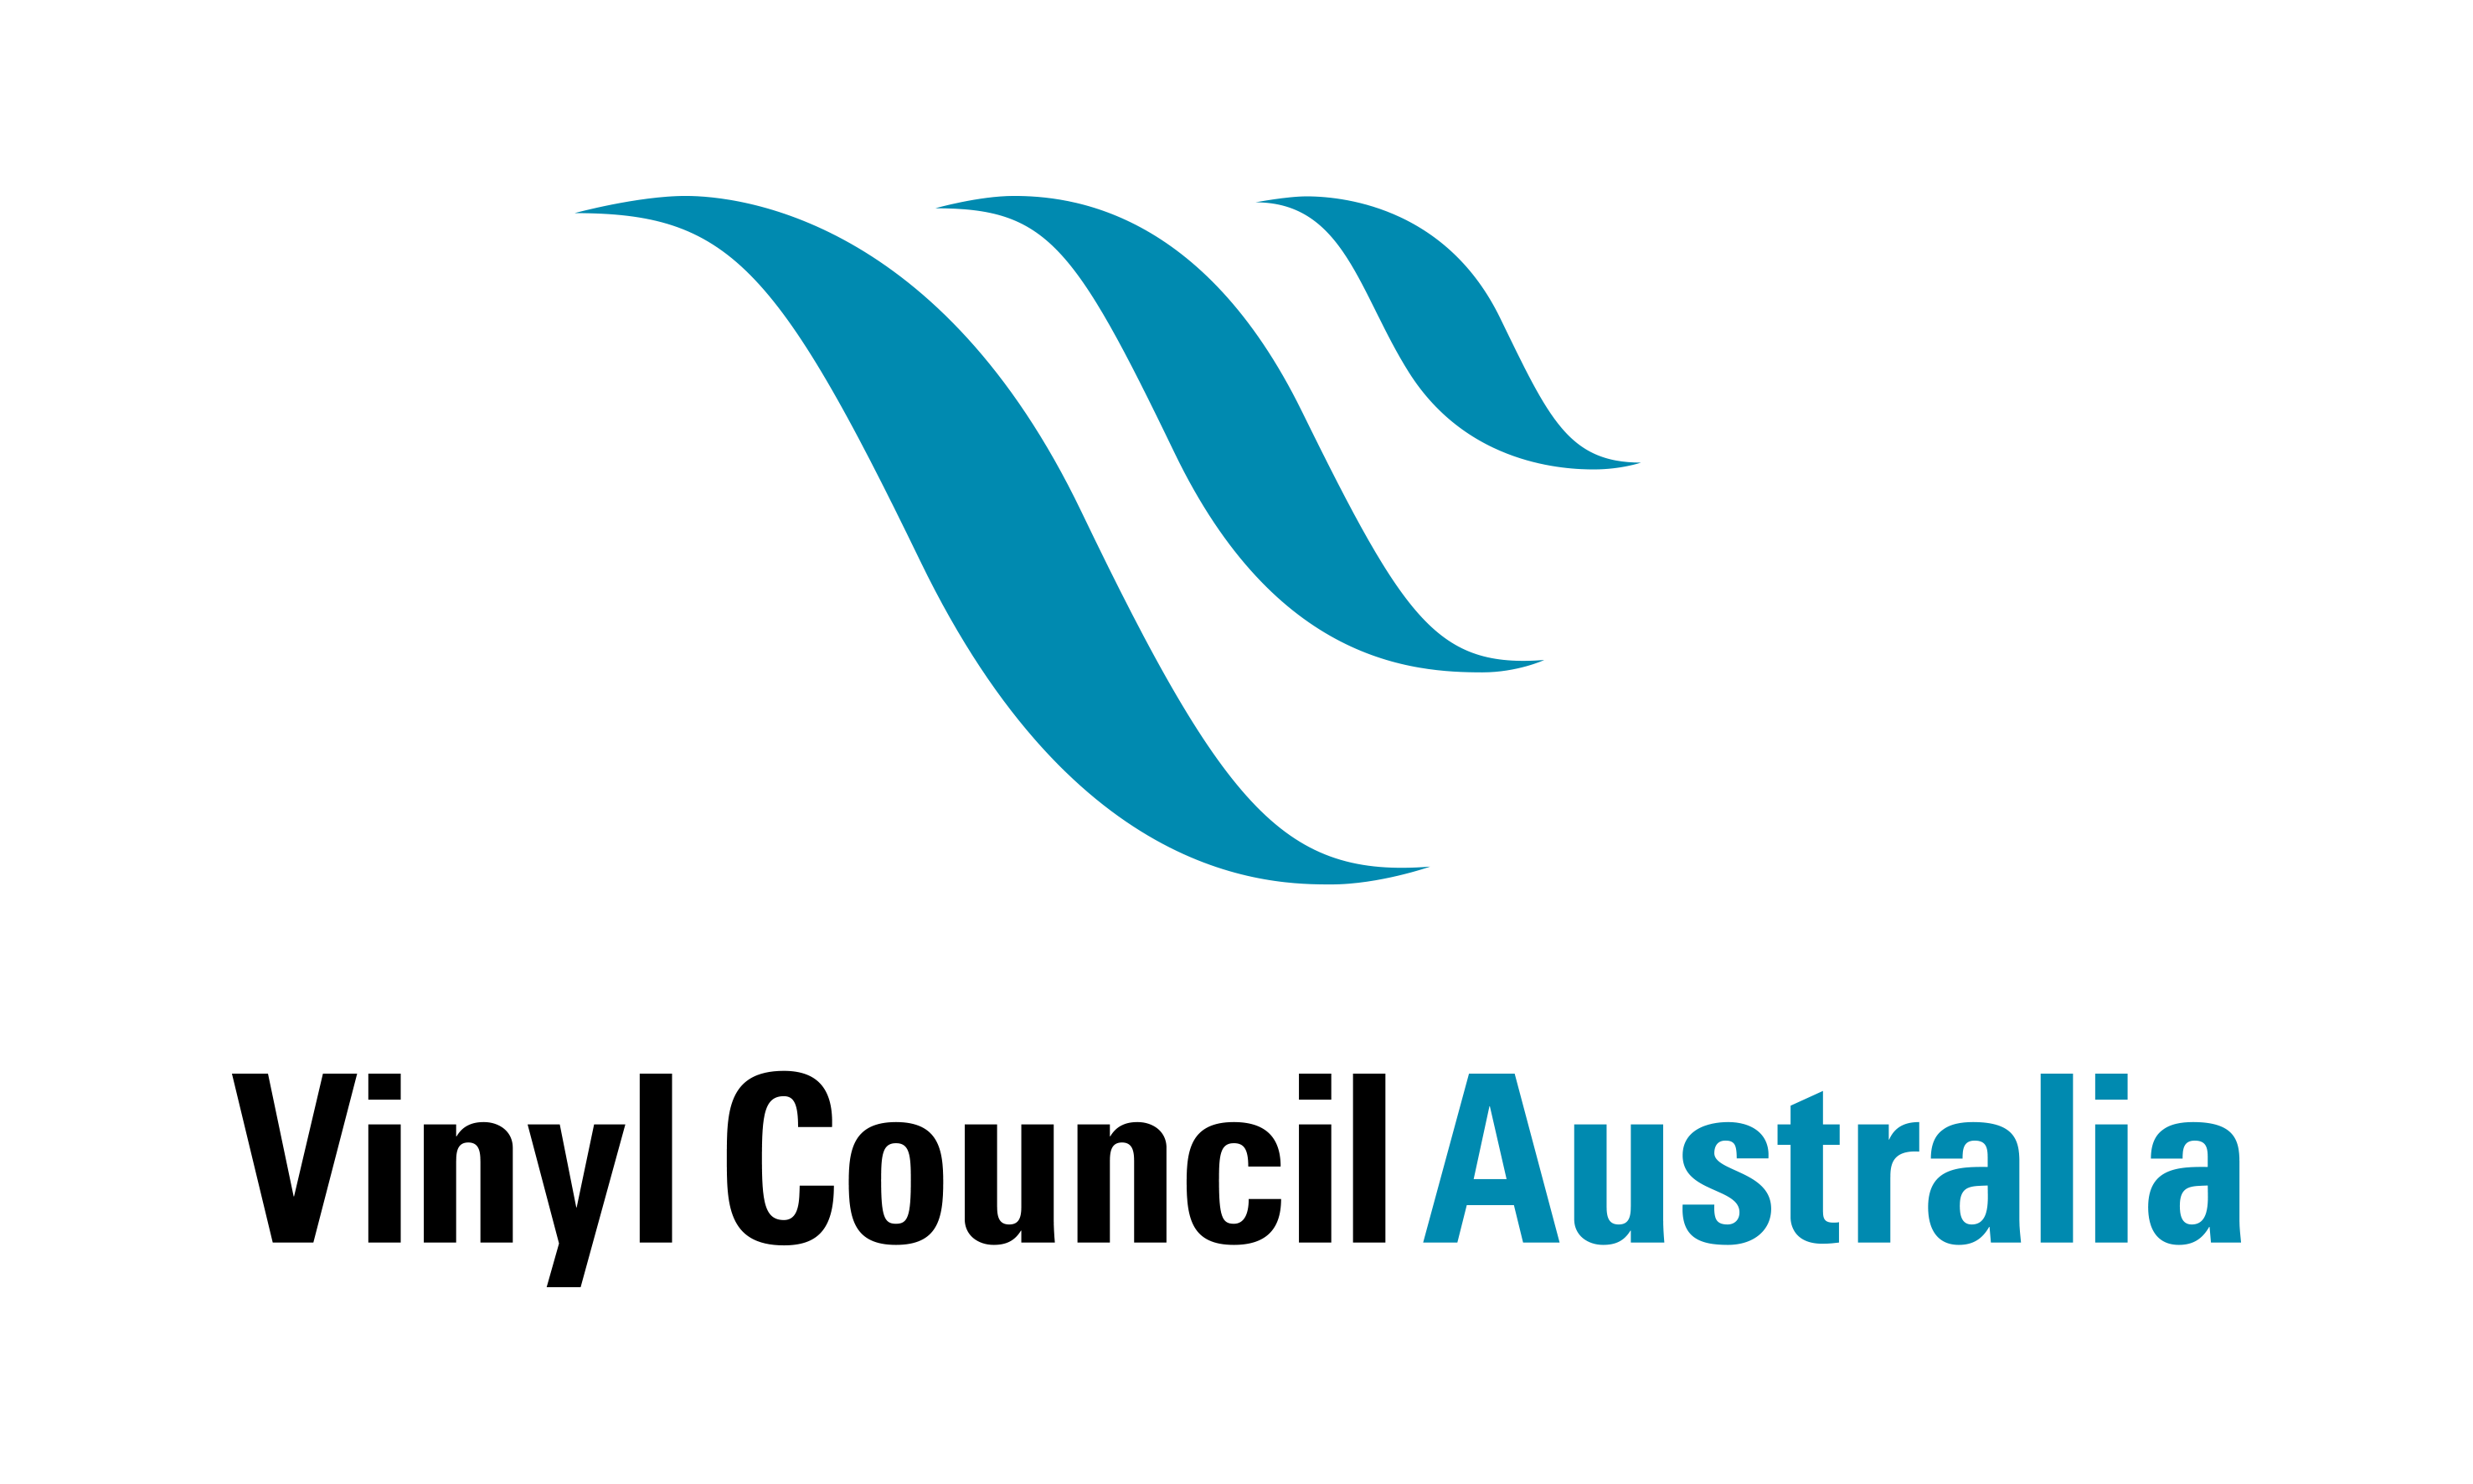 Vinyl Council Australia